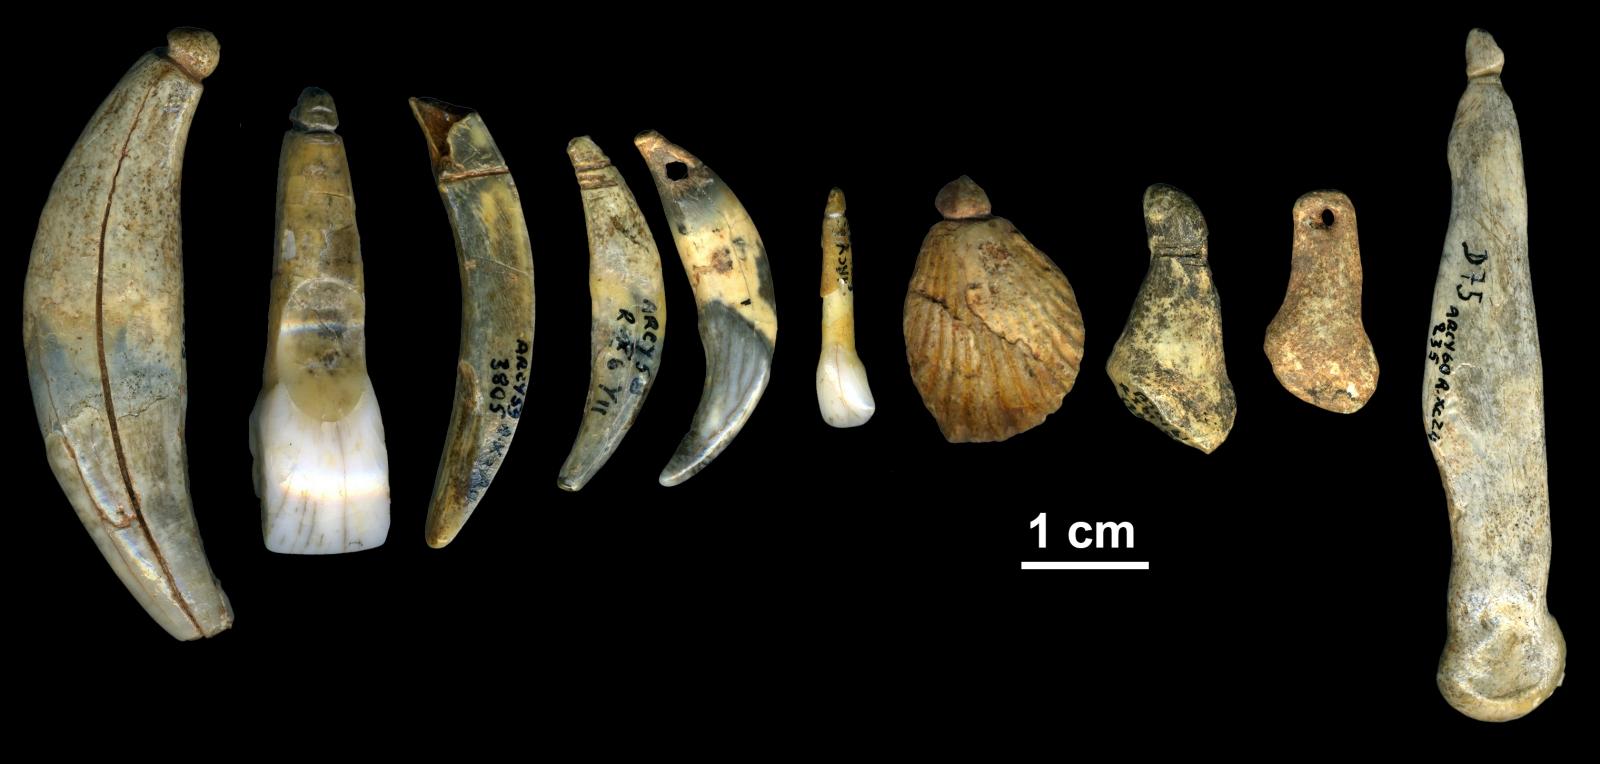 Châtelperronian neanderthals